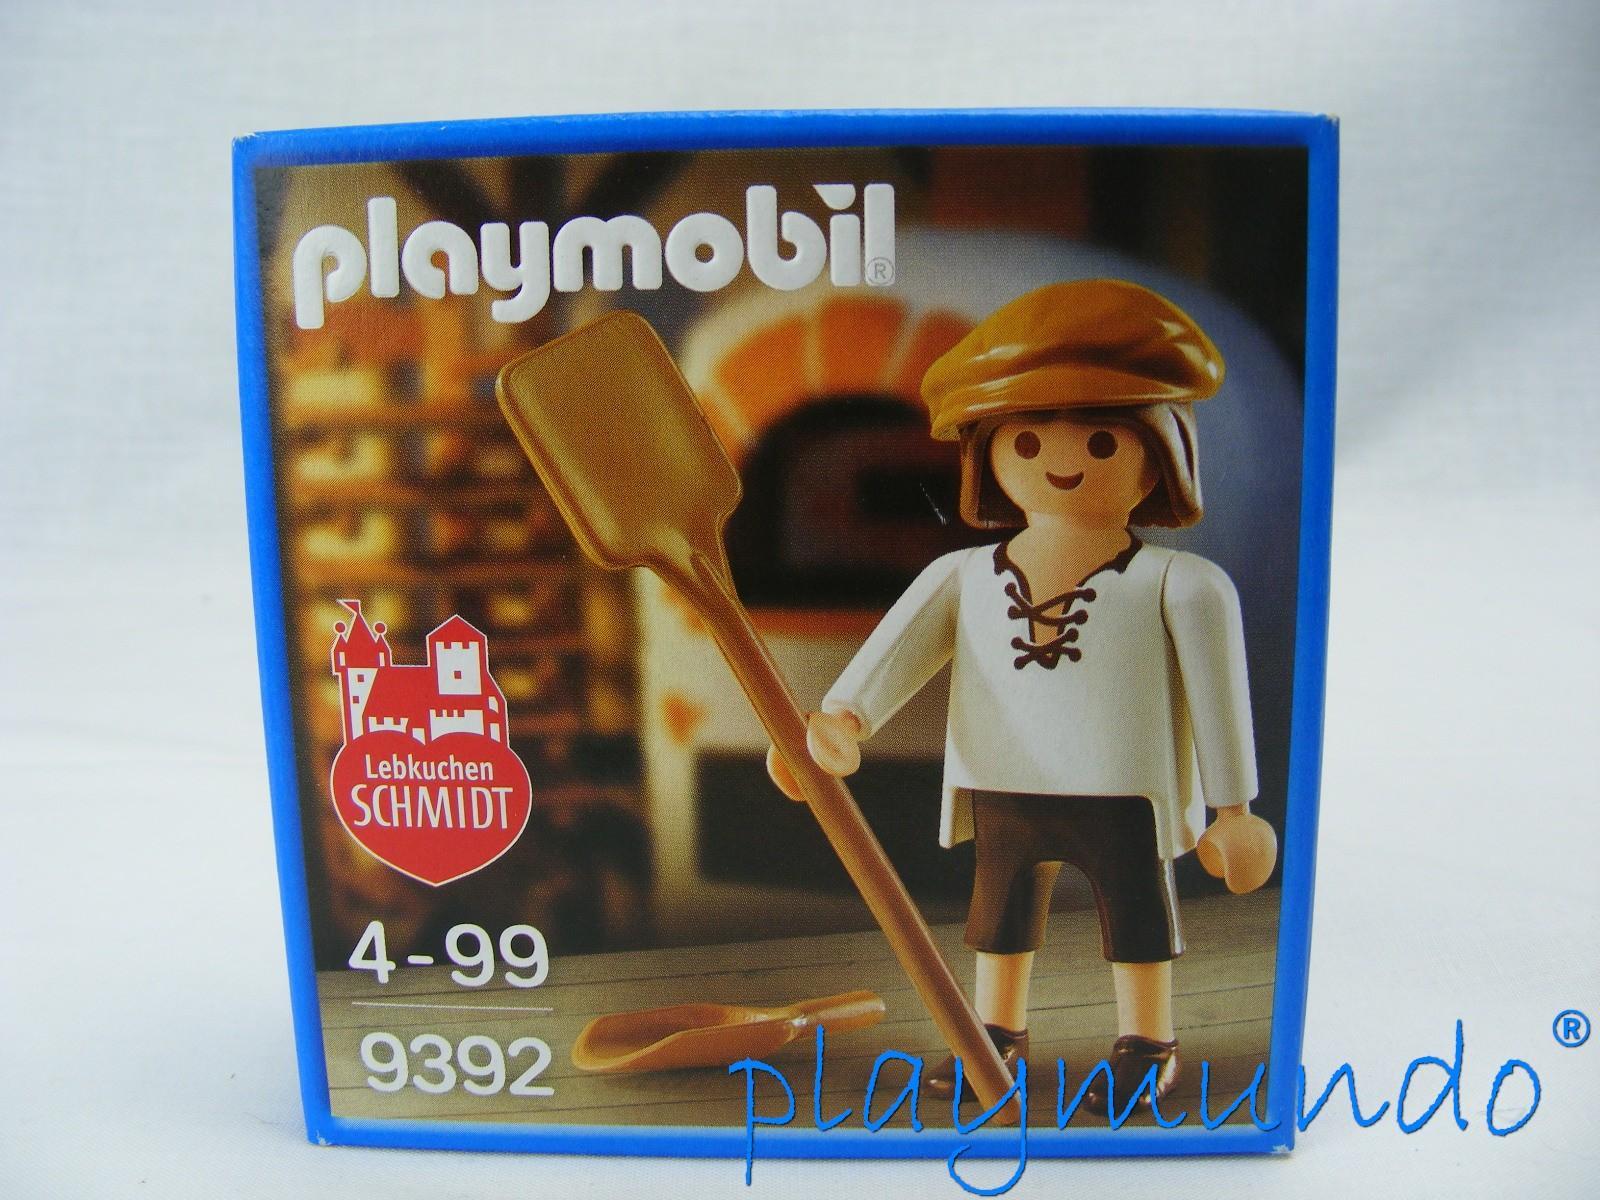 PLAYMOBIL 9392 PANADERO MEDIEVAL LEBKUCHEN SCHMIDT